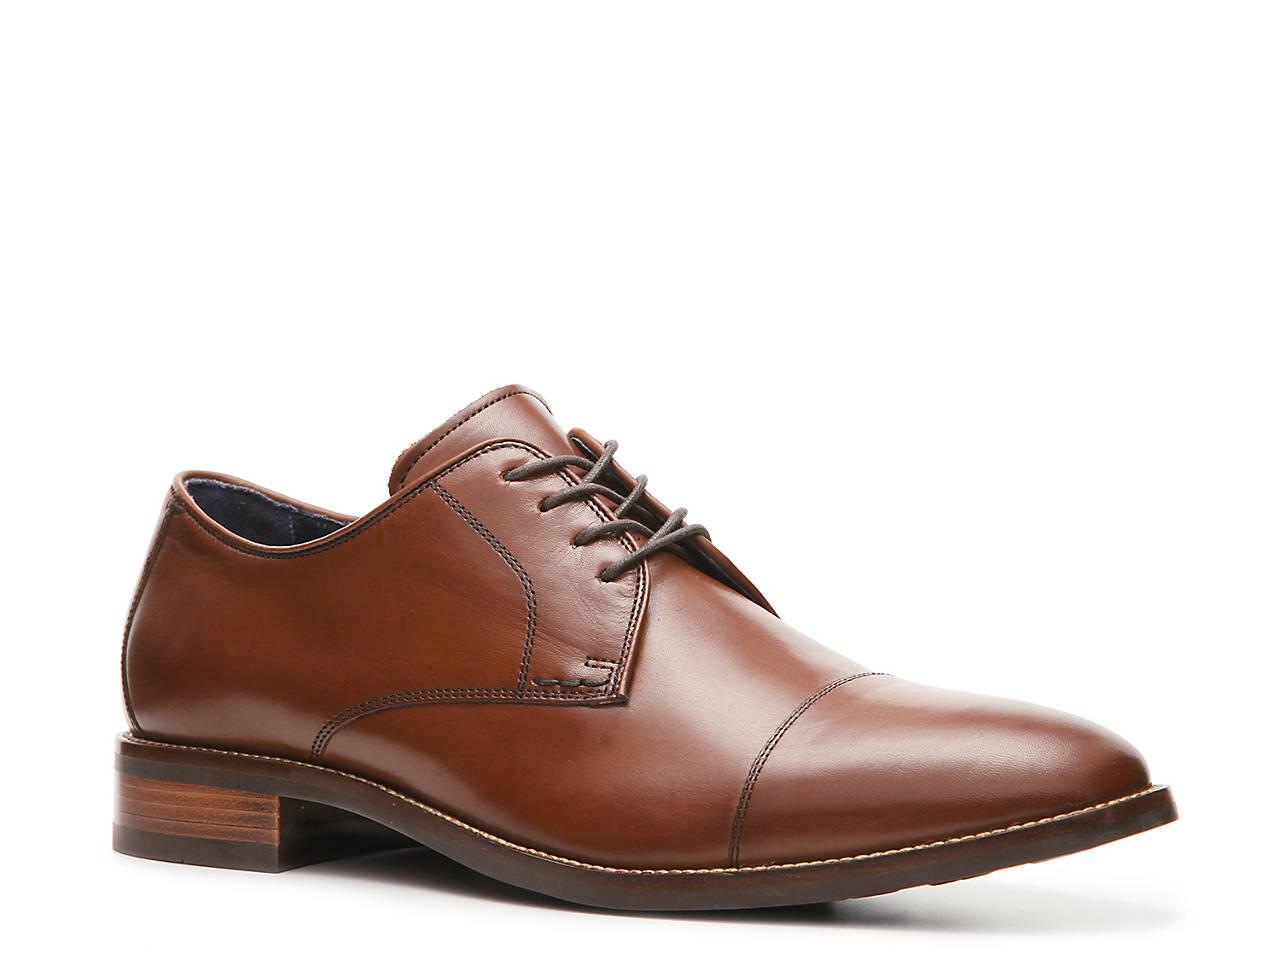 826025d1c Cole Haan Lenox Hill Cap Toe Oxford Men s Shoes